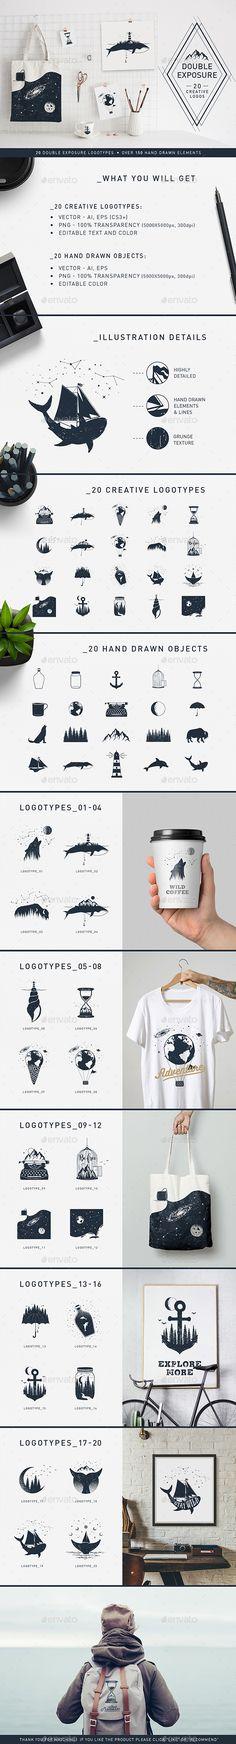 #Double Exposure. 20 Creative #Logos - #Vectors